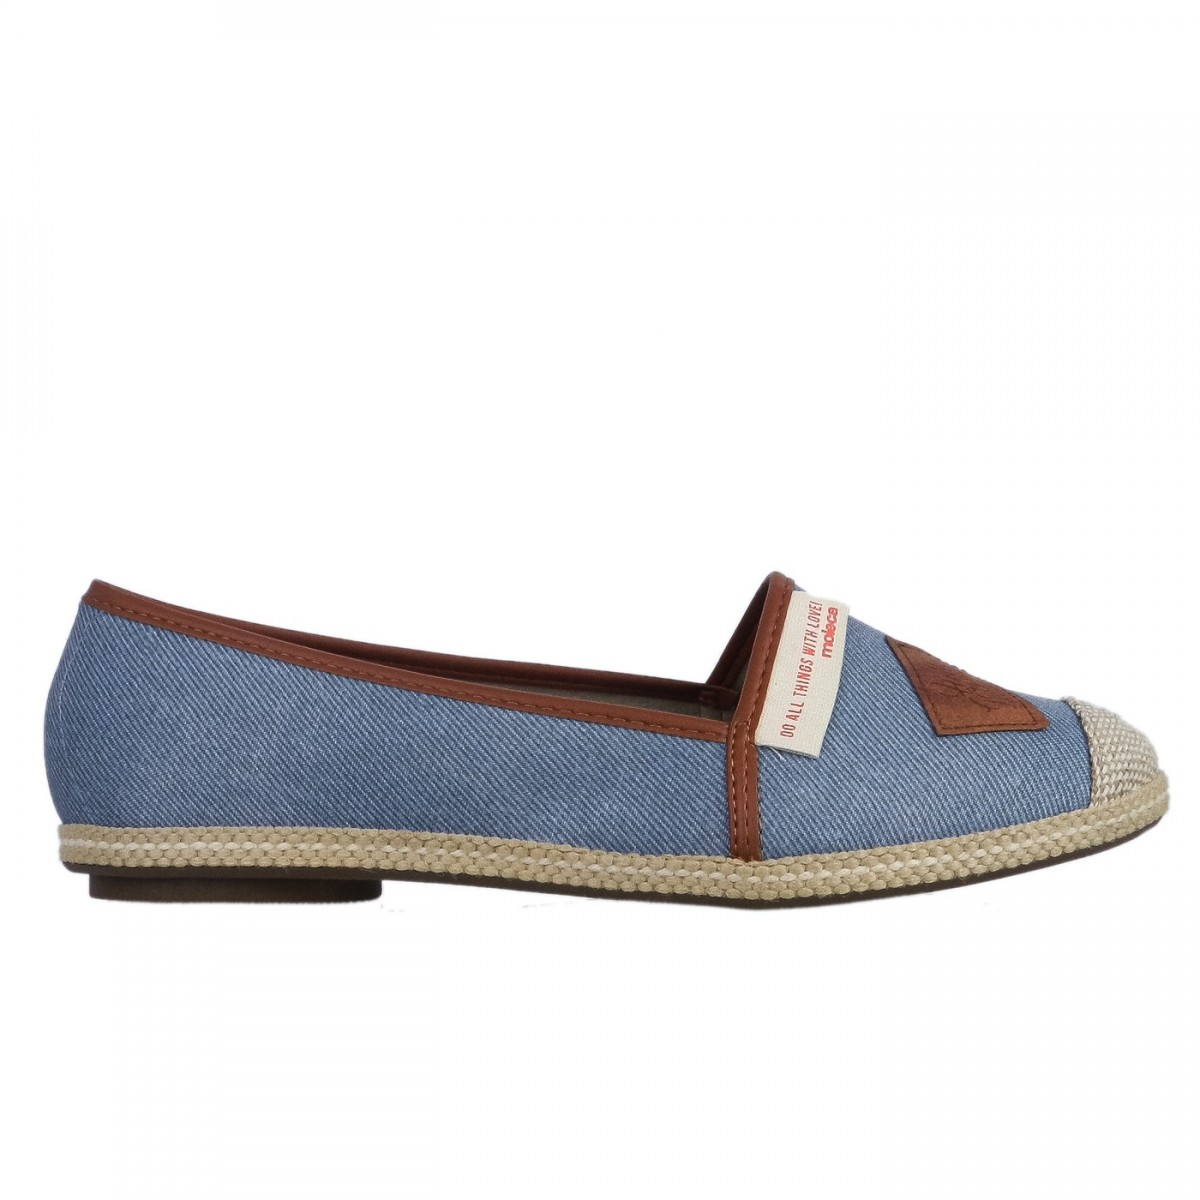 a674971f2 Bizz Store - Sapatilha Feminina Moleca Tecido Jeans Azul Casual